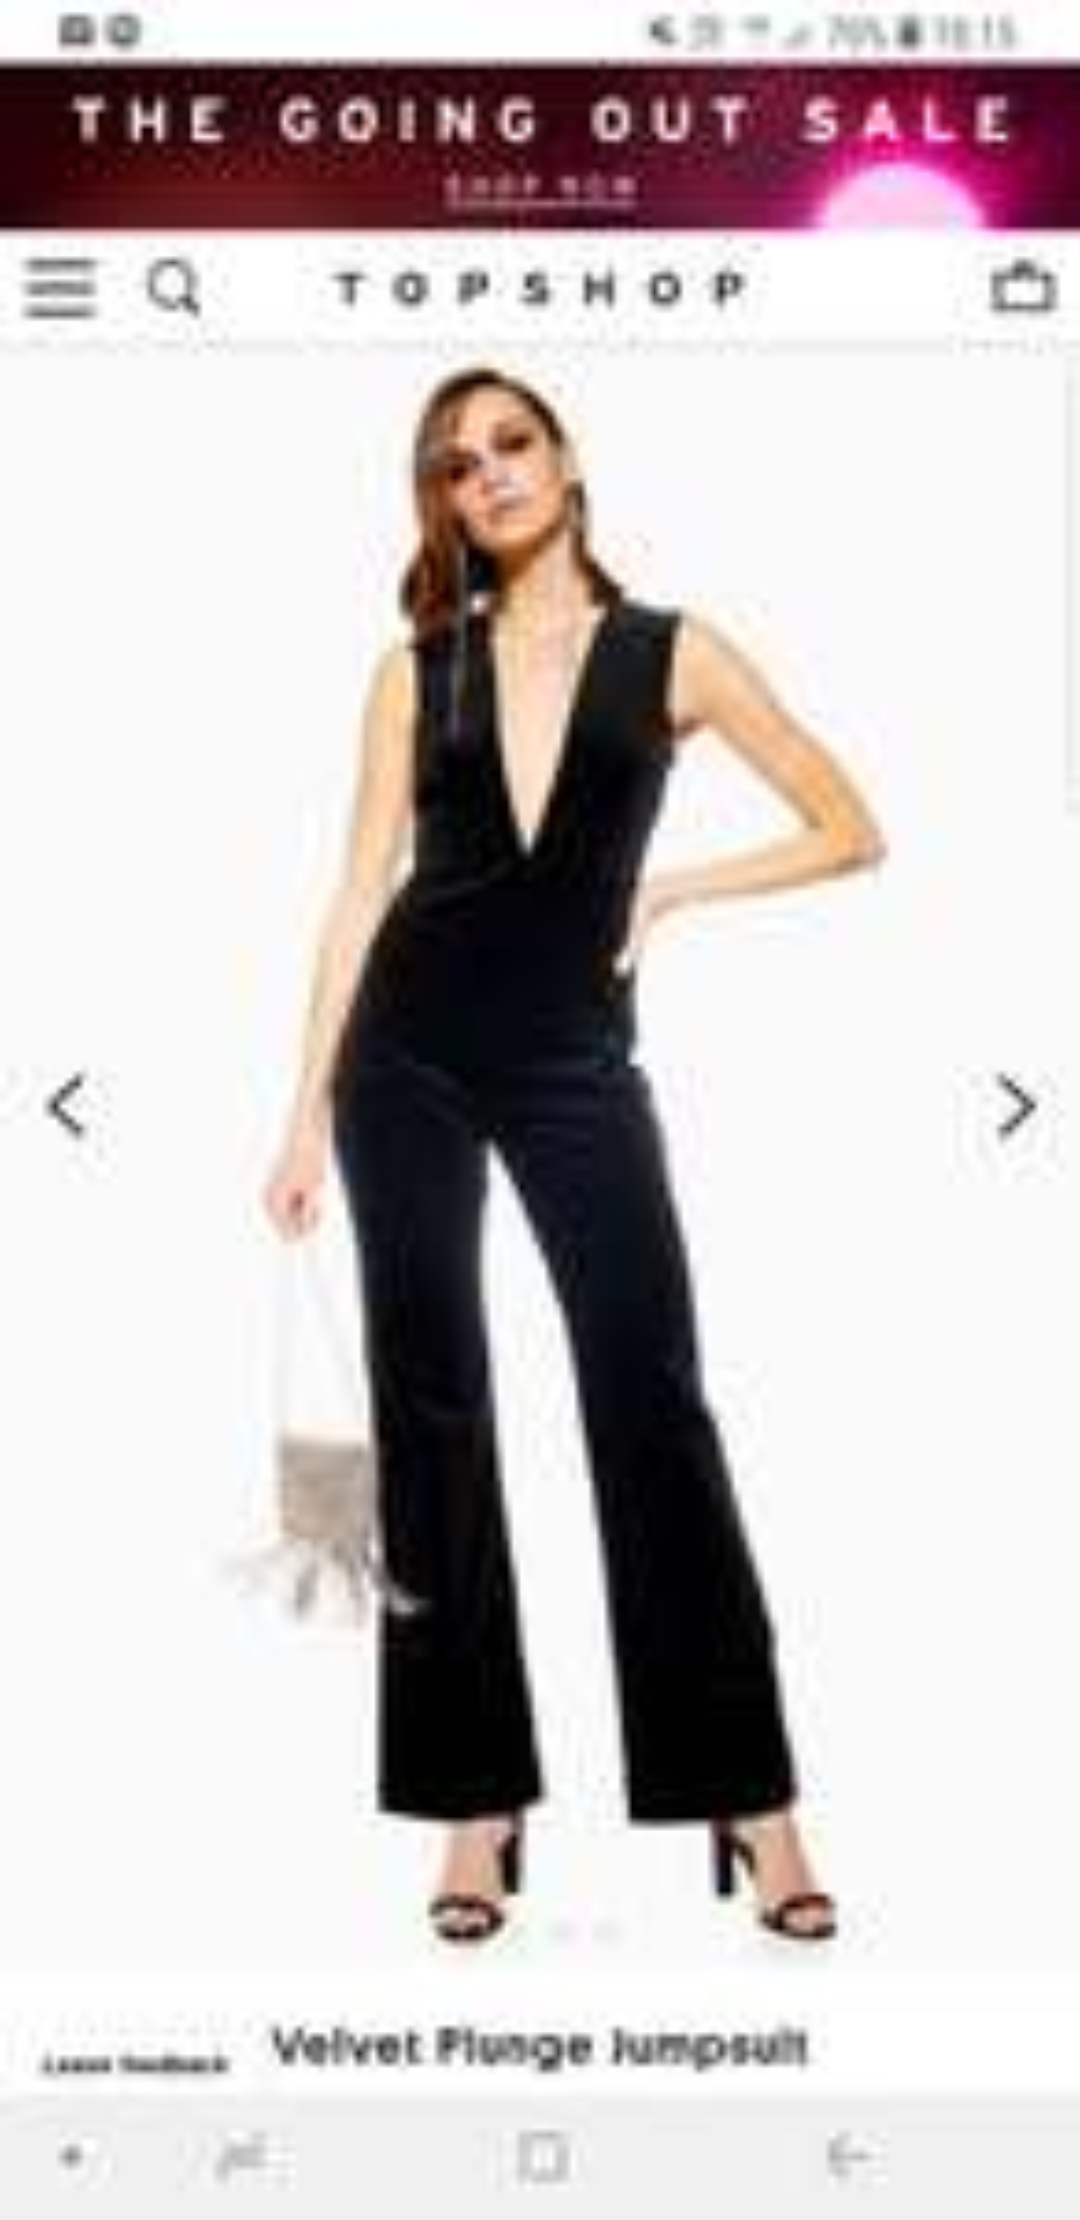 Topshop sale upto half price -  Velvet Plunge Jumpsuit now £30 - Free c&c